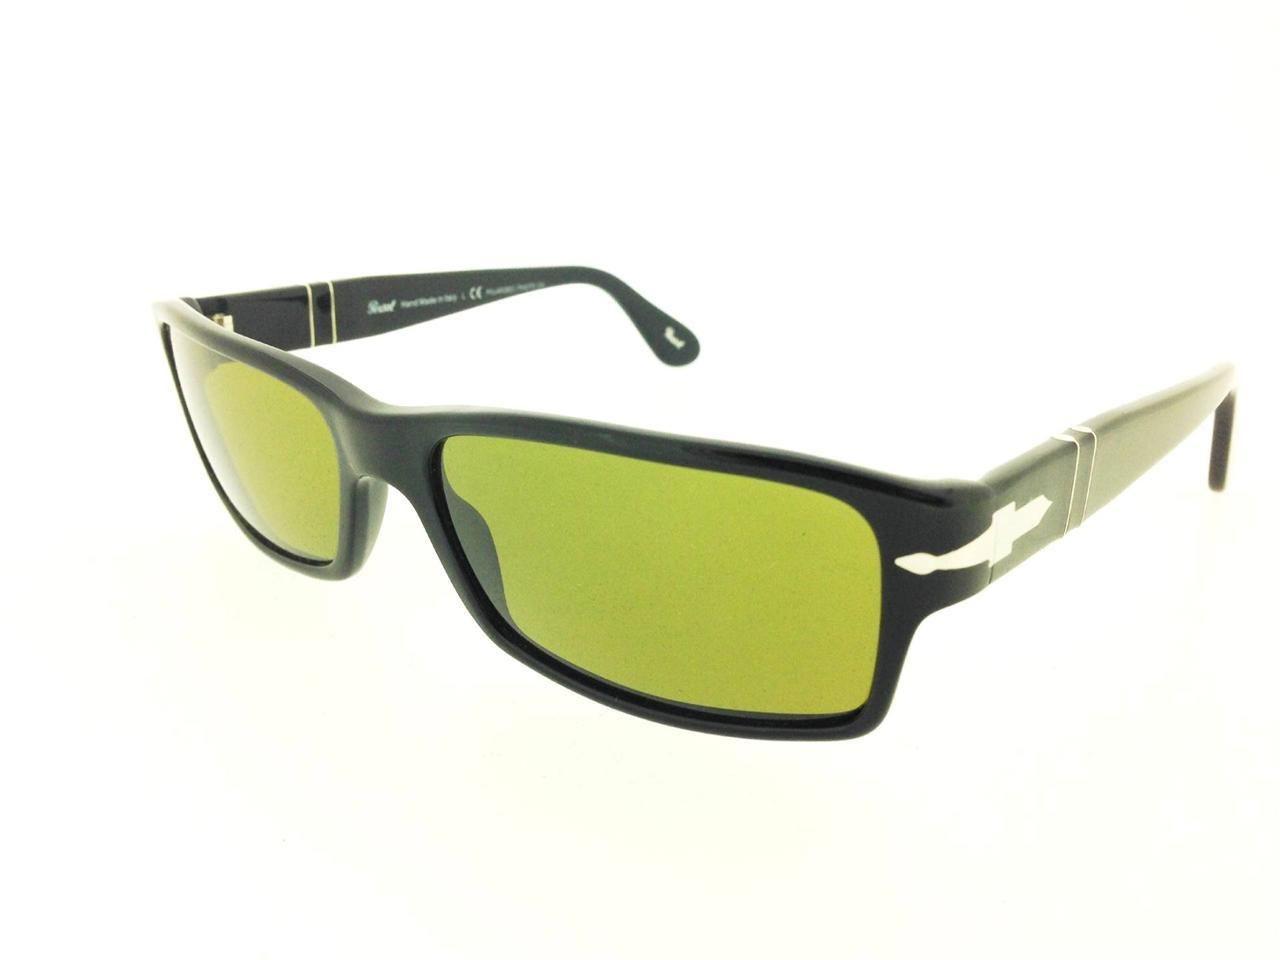 c89476f107 PERSOL PO 2747S Sunglasses 95 24 Blk 54-16-140 - Elite Eyewear Studio